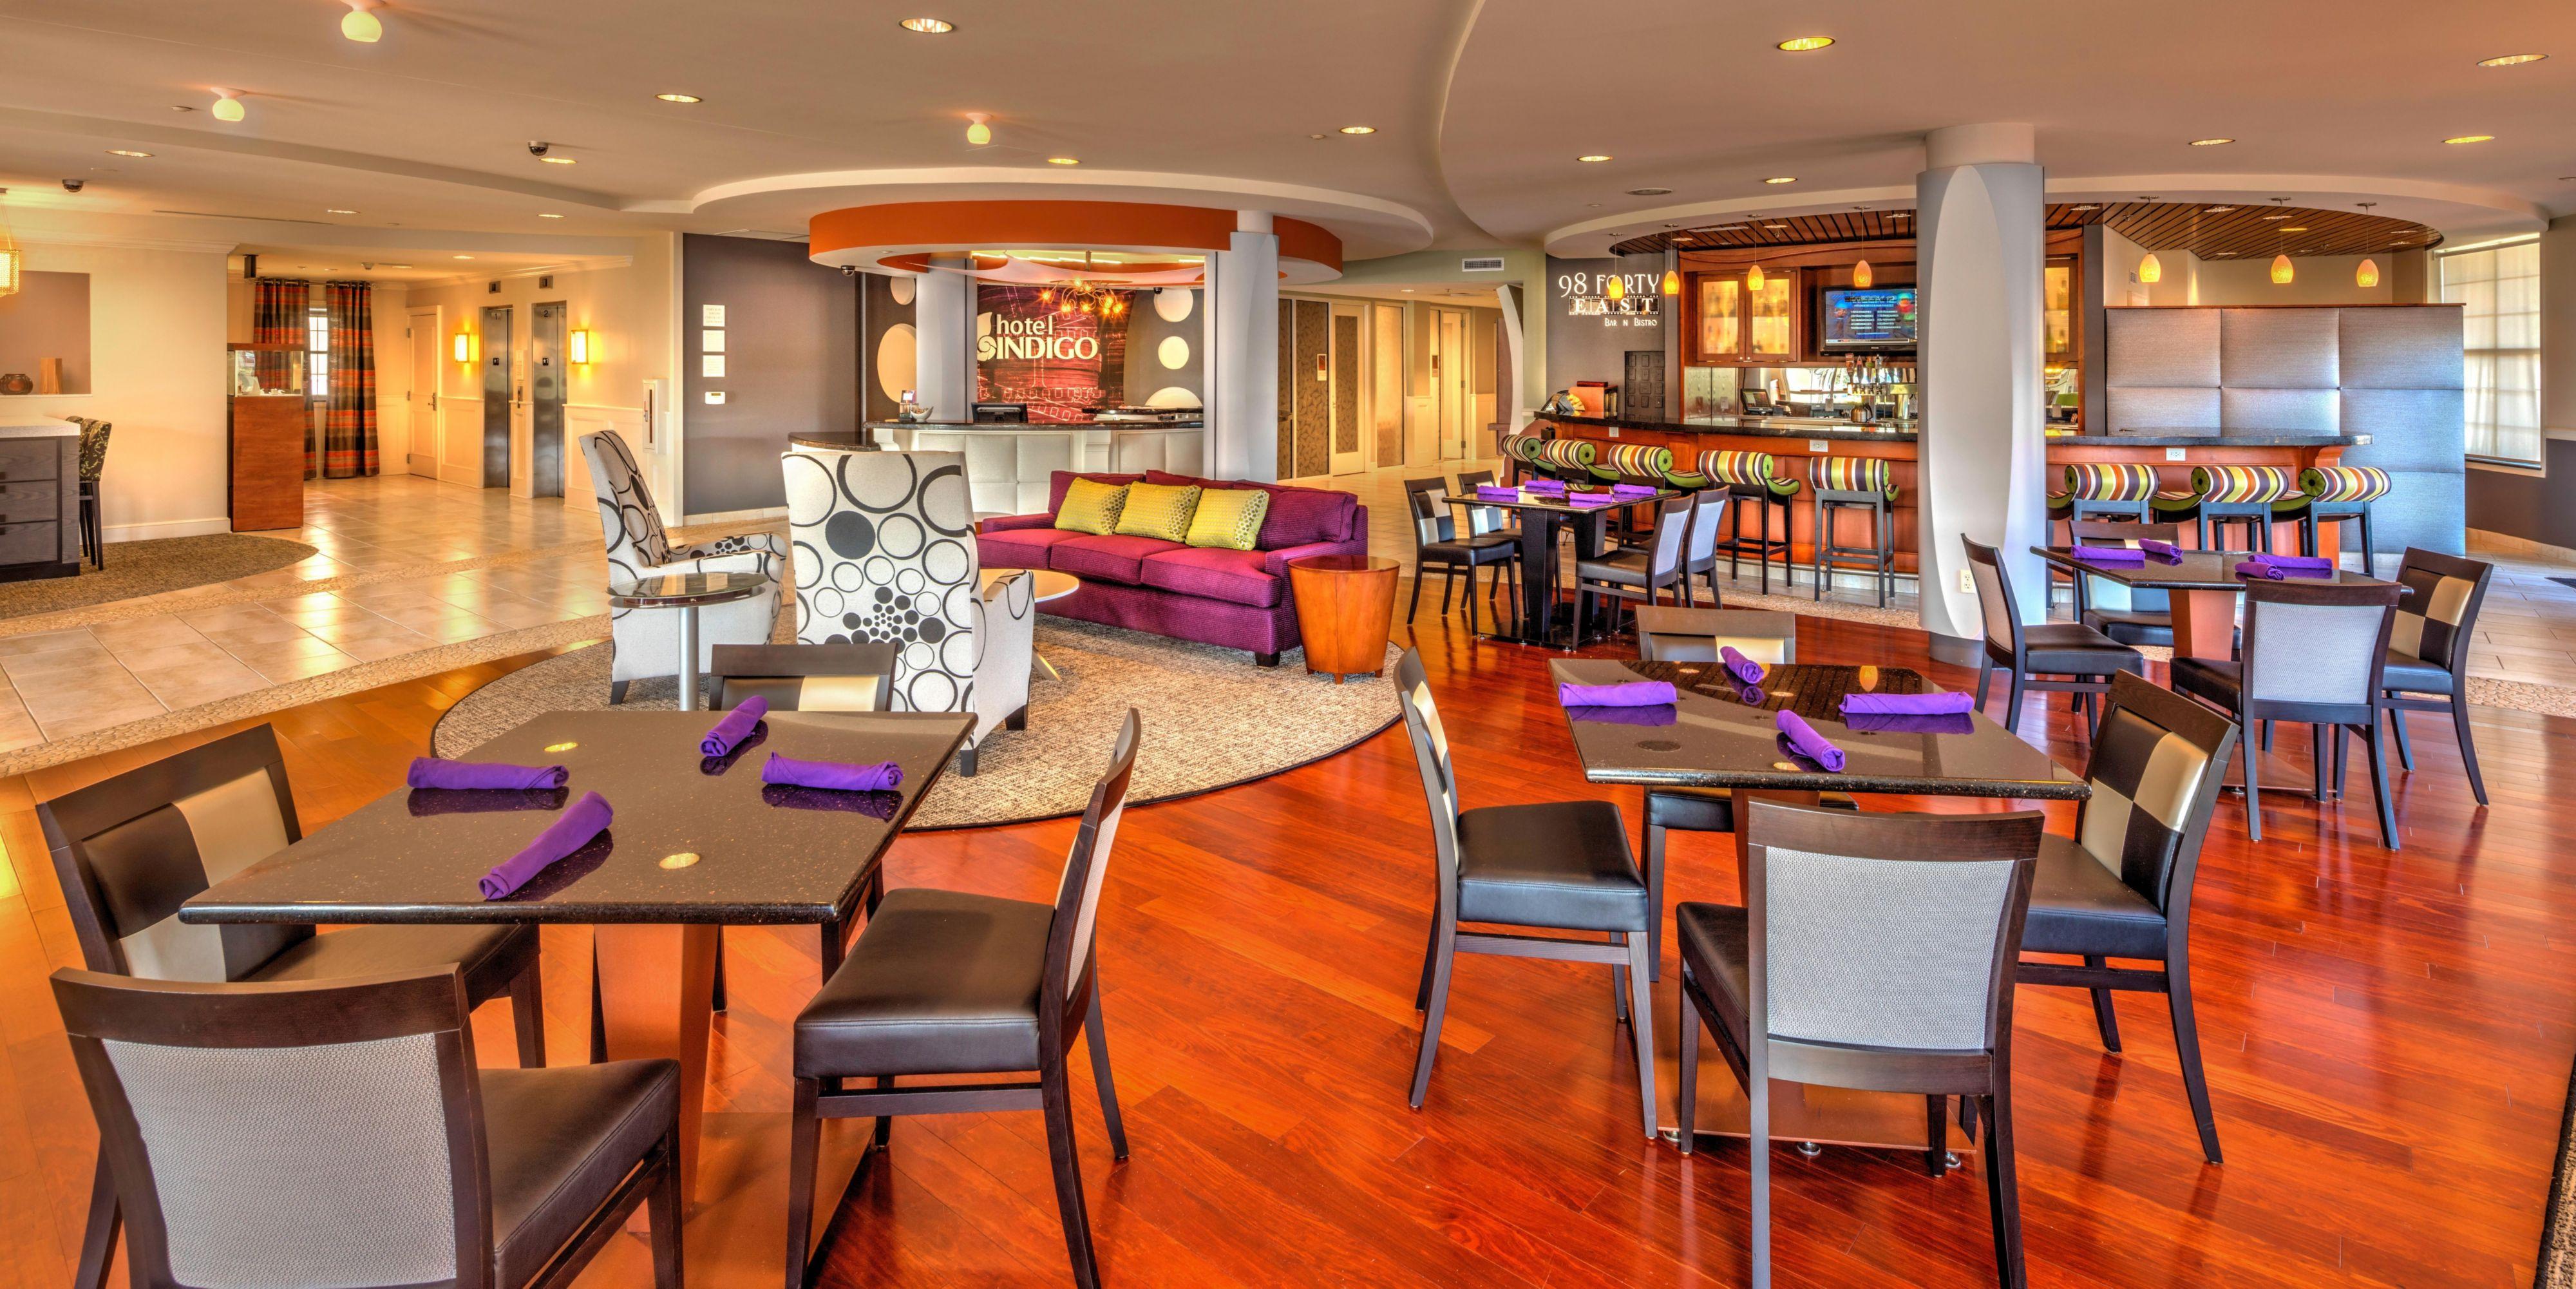 Hotel Indigo Jacksonville-Deerwood Park image 3